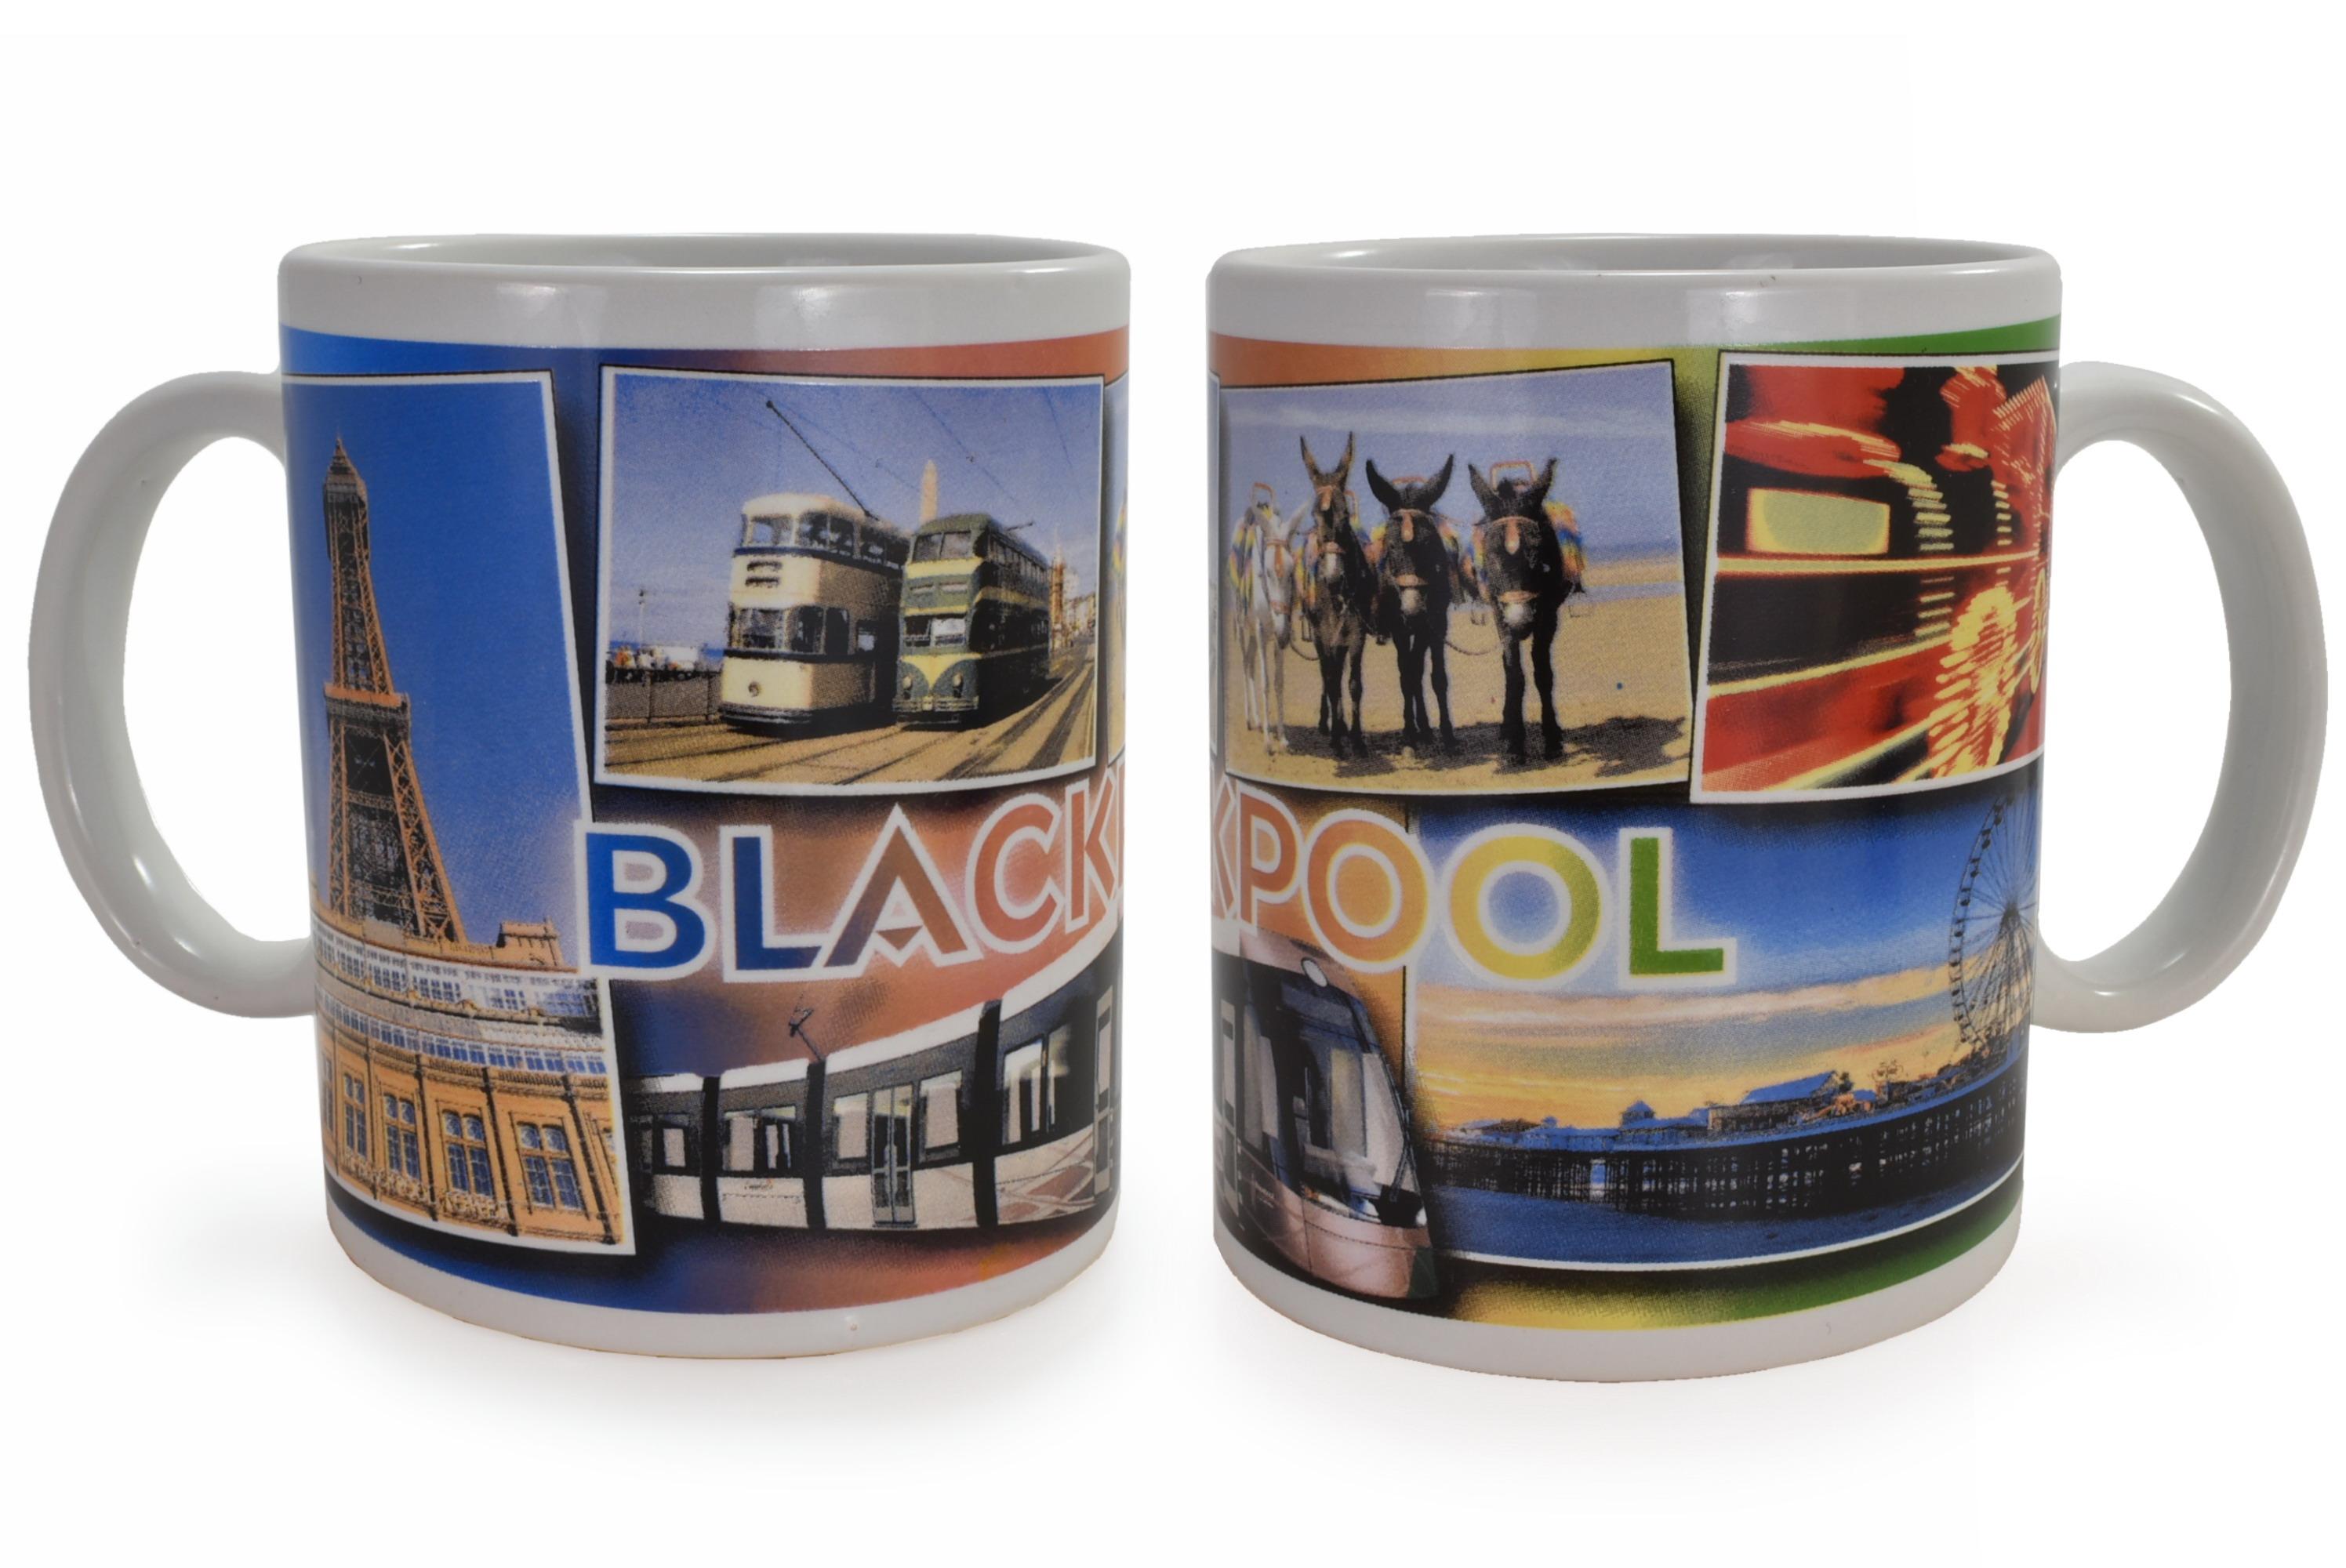 Ceramic Mug Blackpool Scenes Design